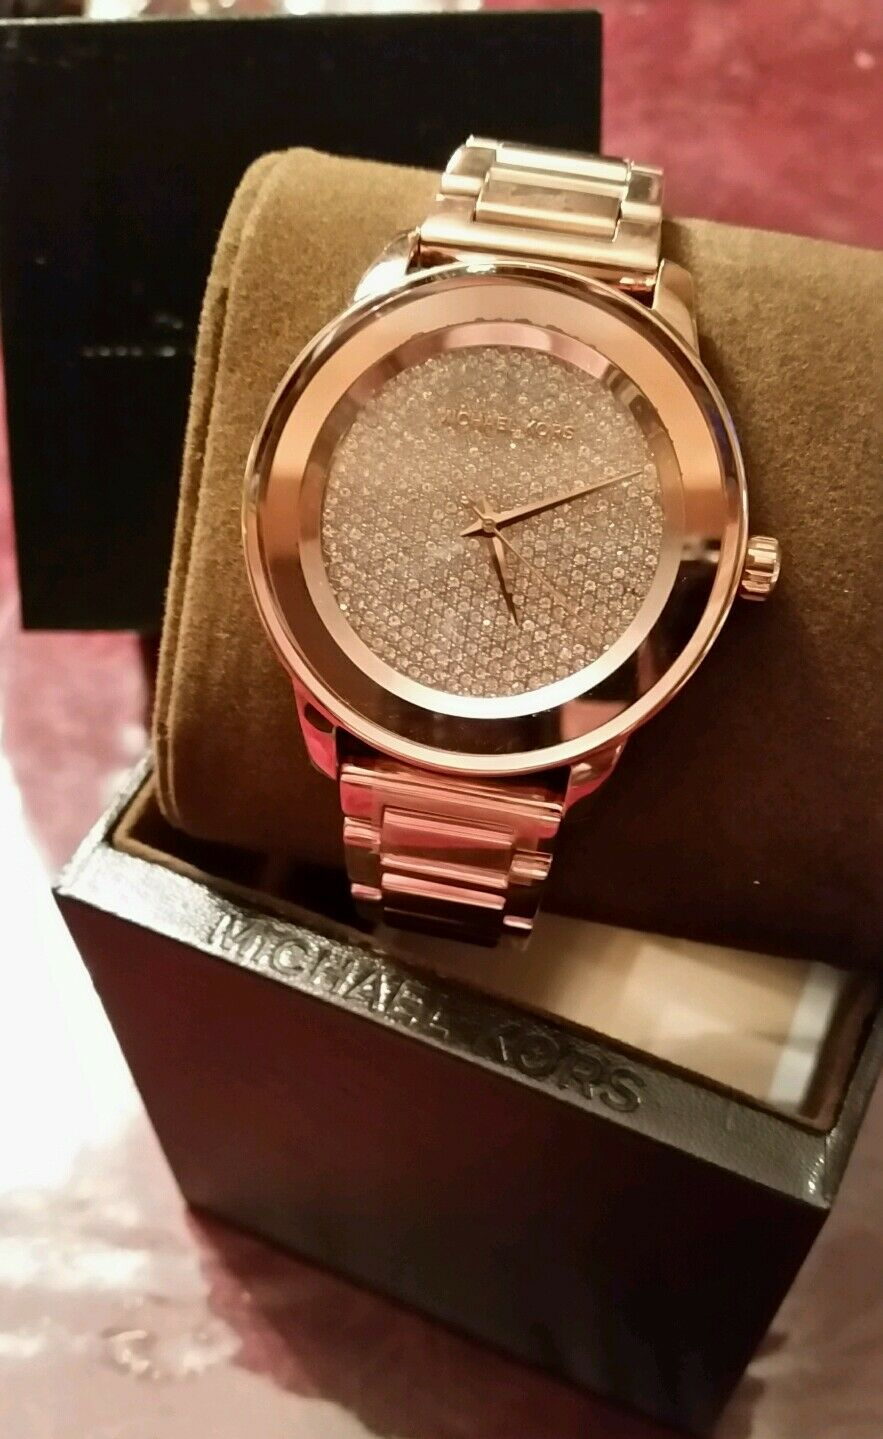 54477e1e0f380 Michael Kors Kinley Rose Gold Watch MK6210 for sale online